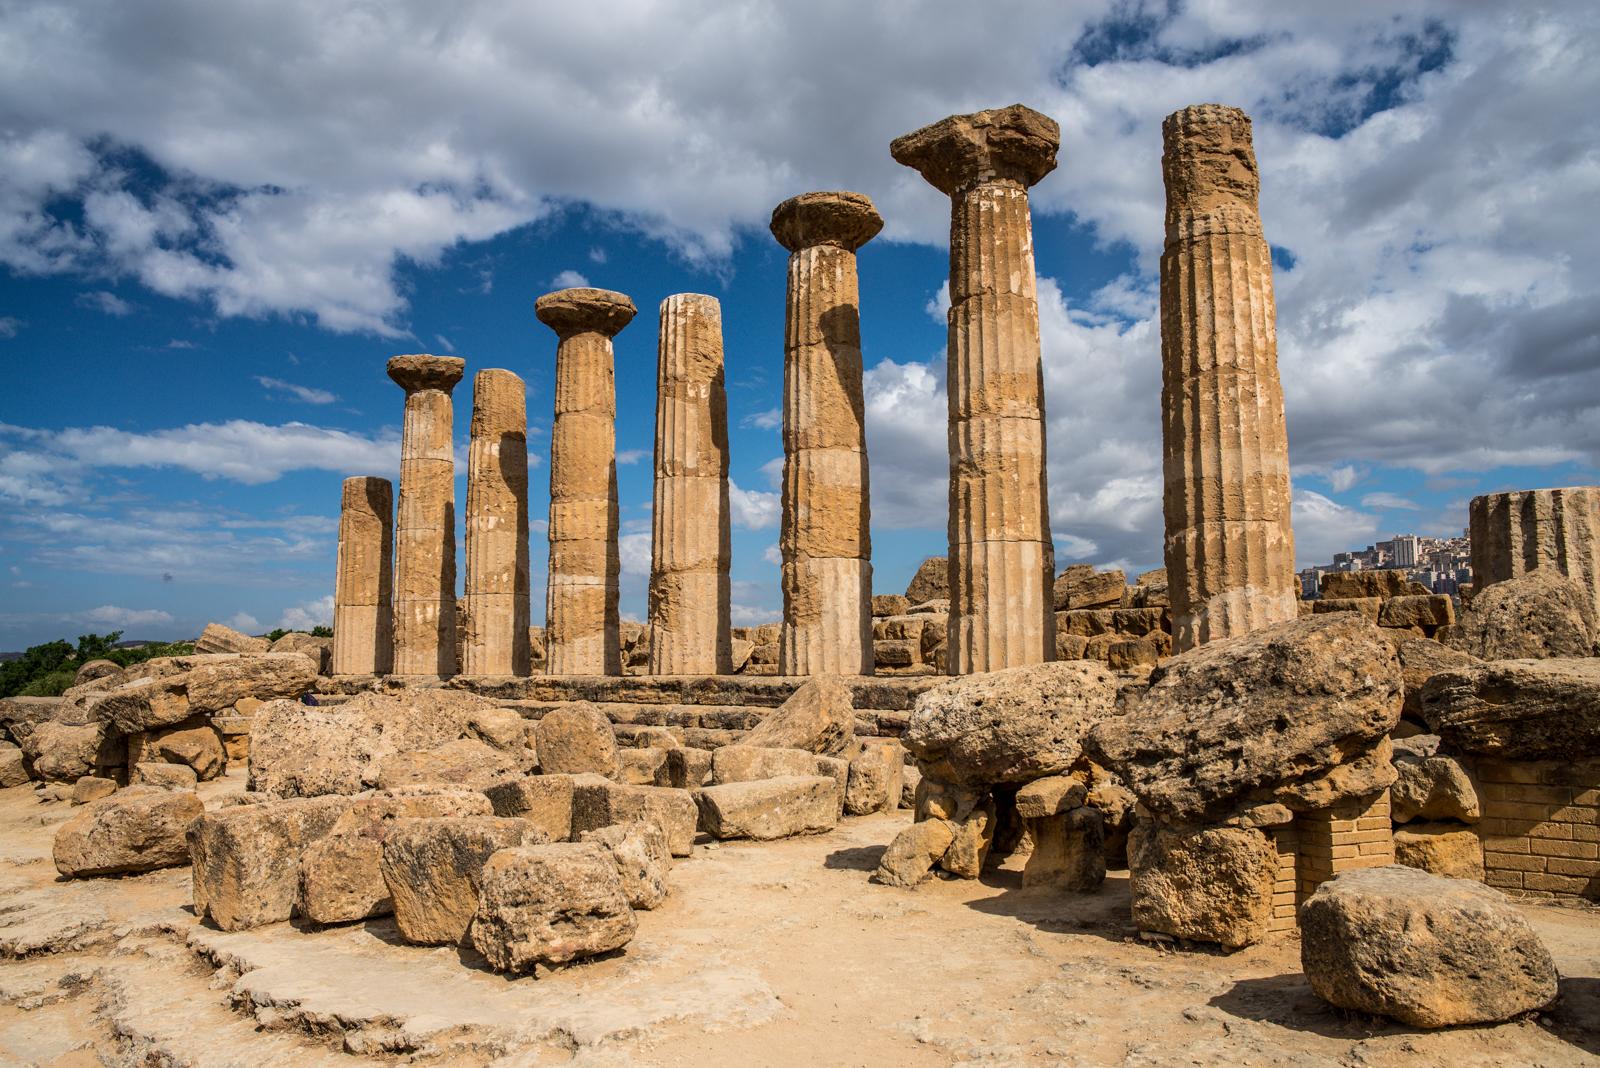 File:Templo de Hércules (Agrigento).jpg - Wikimedia Commons